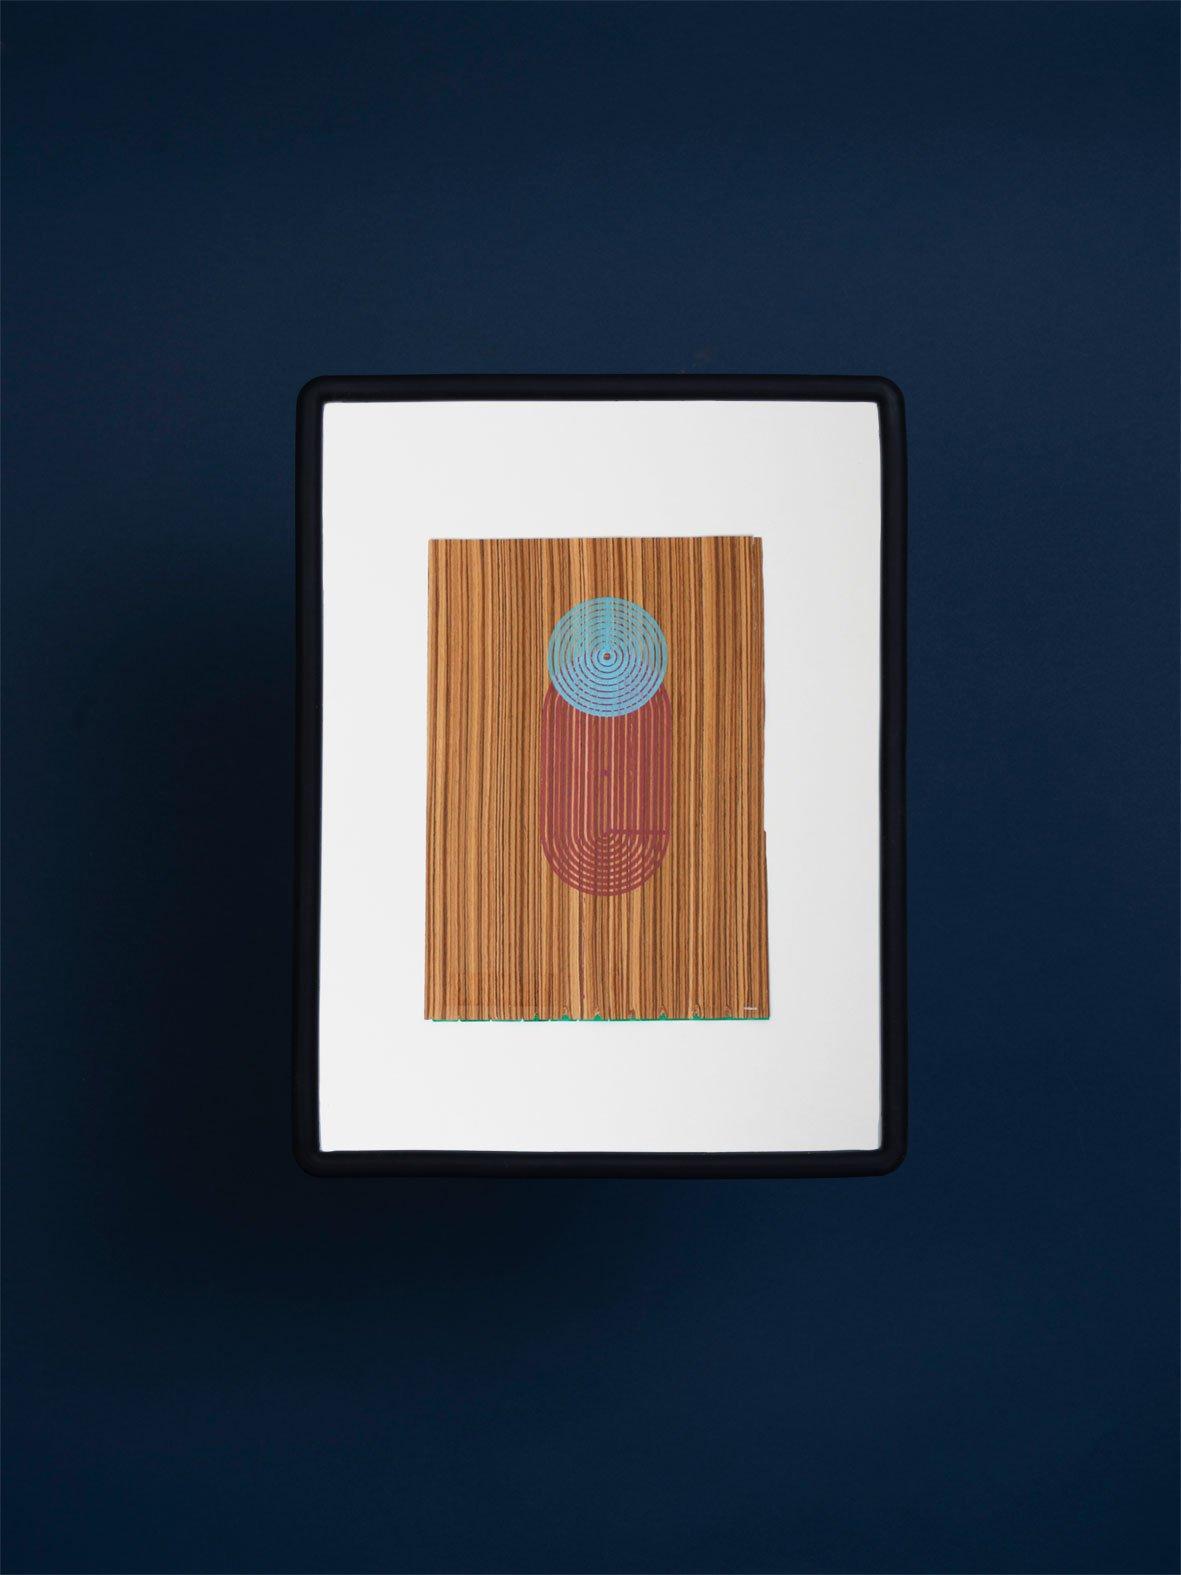 Doodle Wood #1